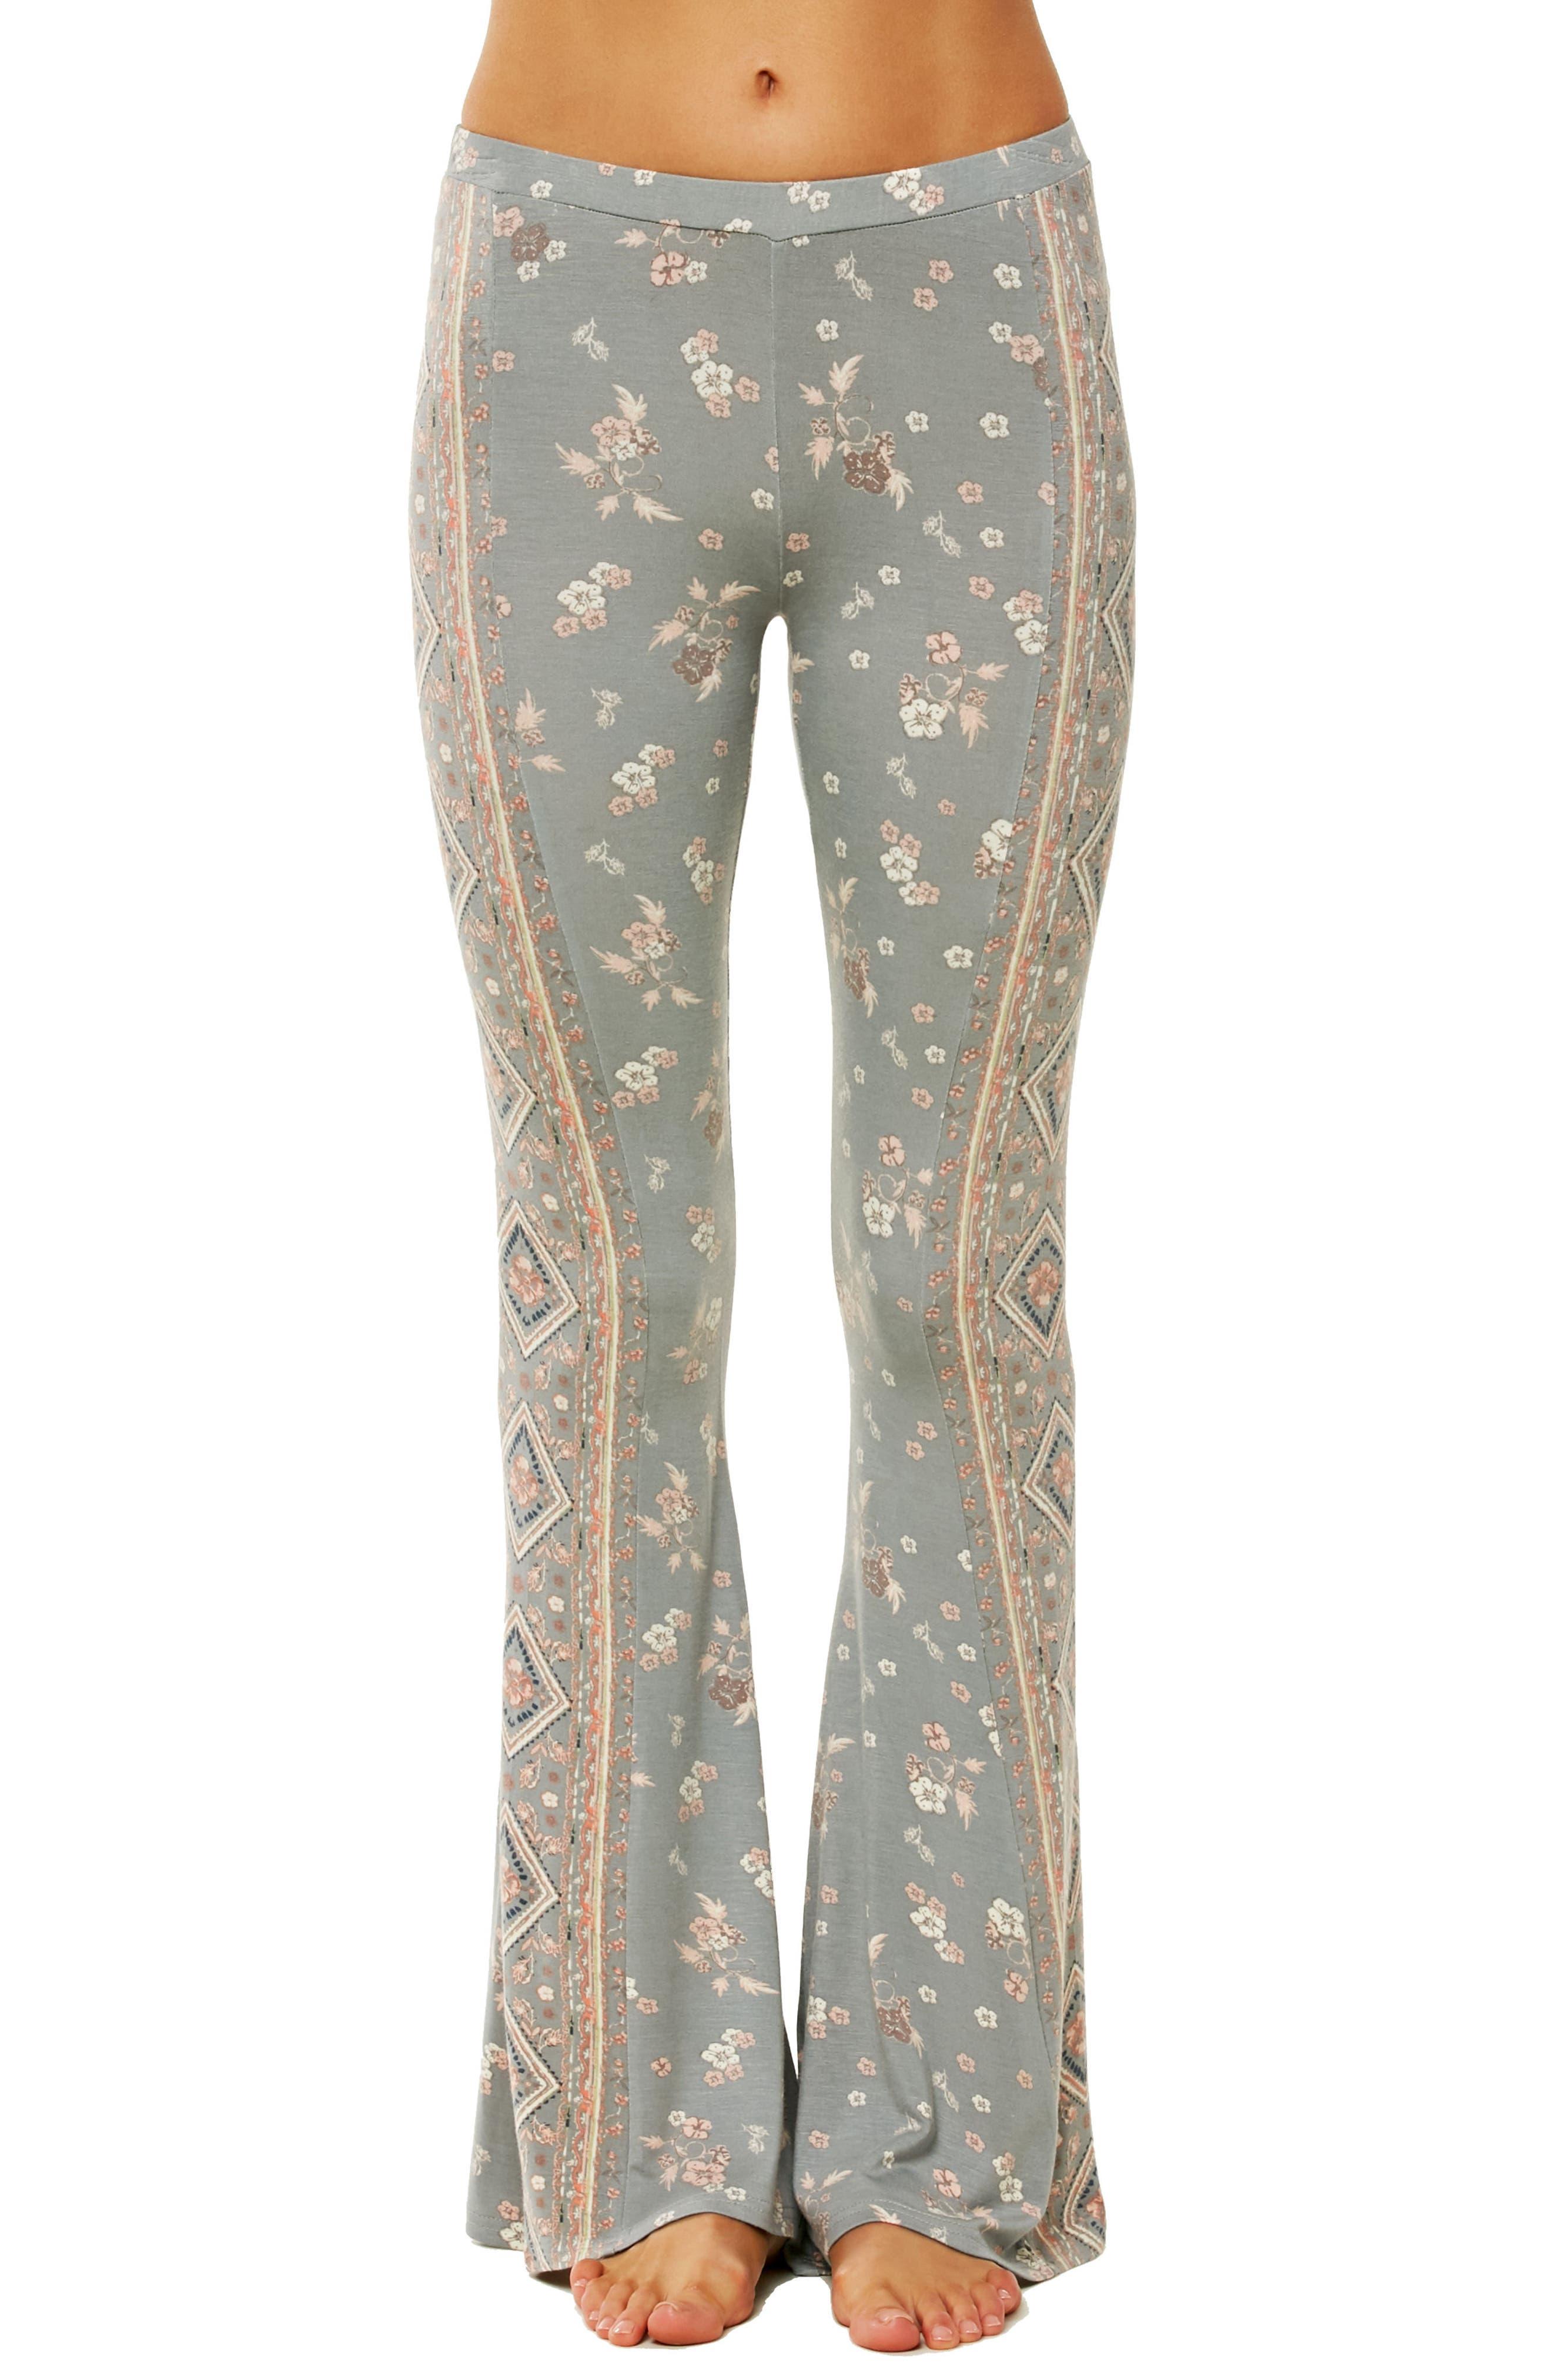 Kelli Knit Flare Pants,                         Main,                         color, Neutral Gray - Fog